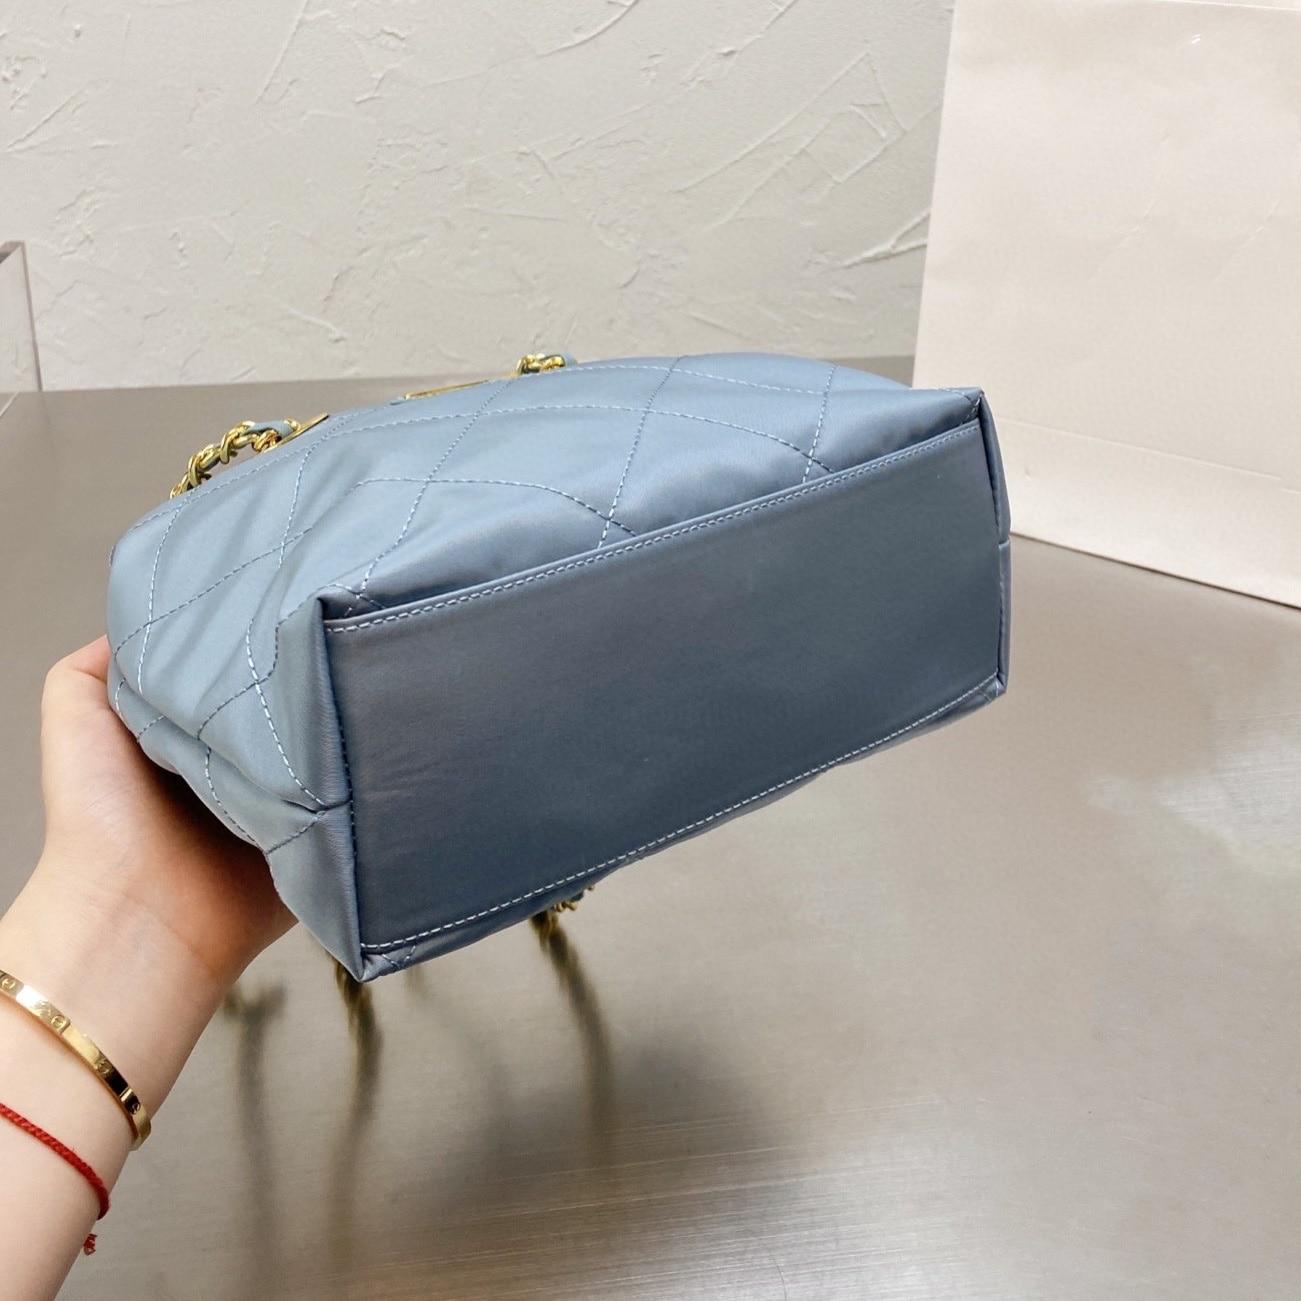 Queenie 2021 جديد مادة النايلون معدن مقلوب مثلث الديكور مريحة وتنوعا واحد في الكتف حقيبة ساعي الإناث